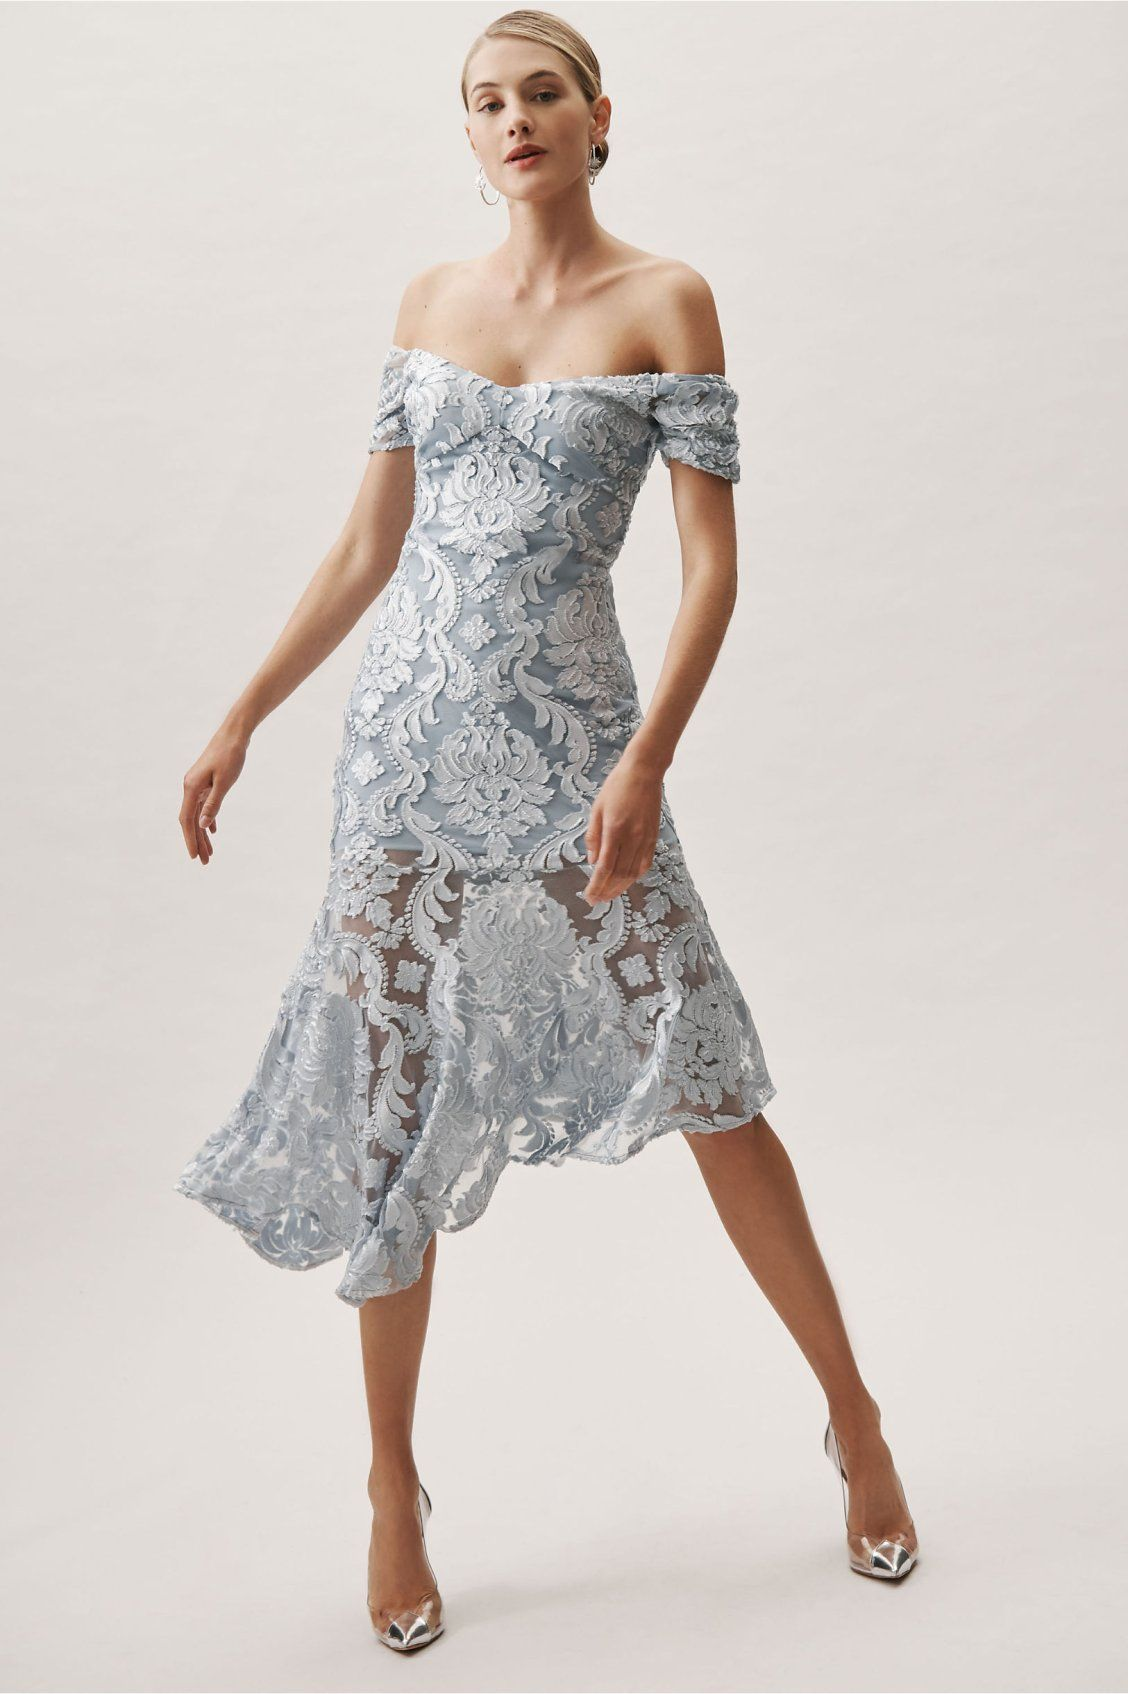 c455c41a3b9b Caralisa Dress from BHLDN. Caralisa Dress ]from BHLDN Black Tie Optional  Wedding ...